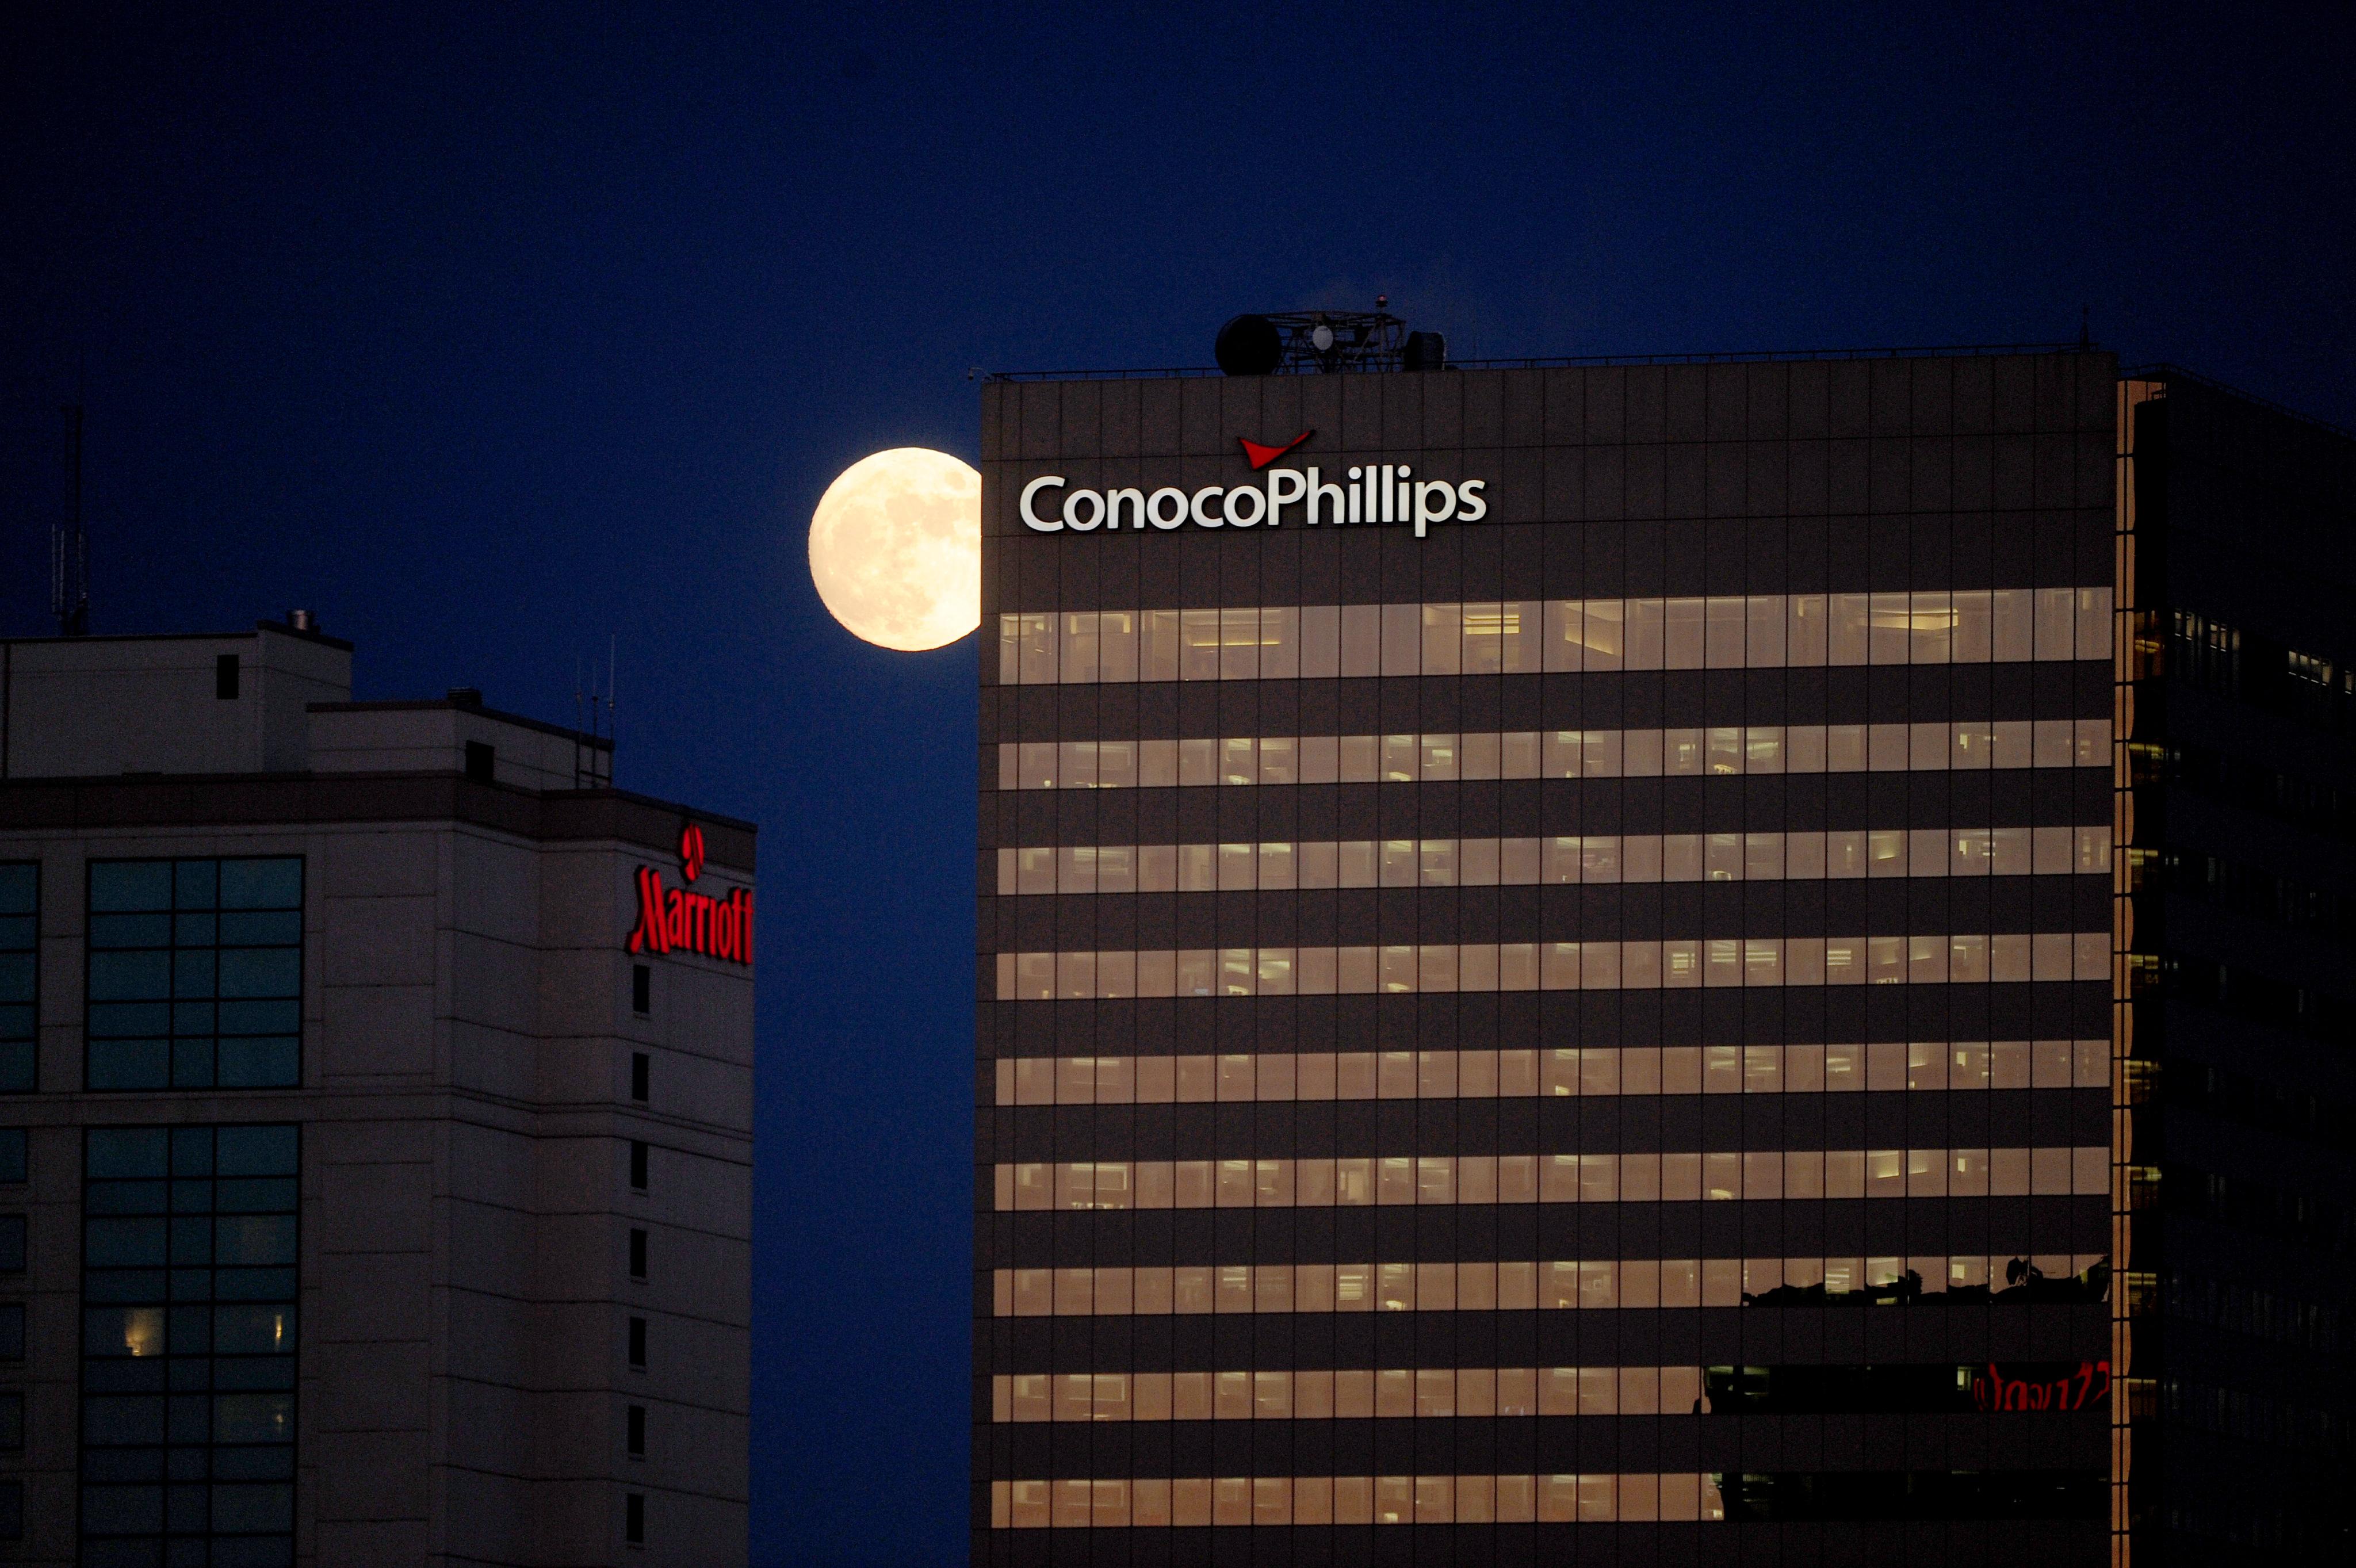 Alaska dials up pressure on ConocoPhillips after it delays controversial Arctic exploration project